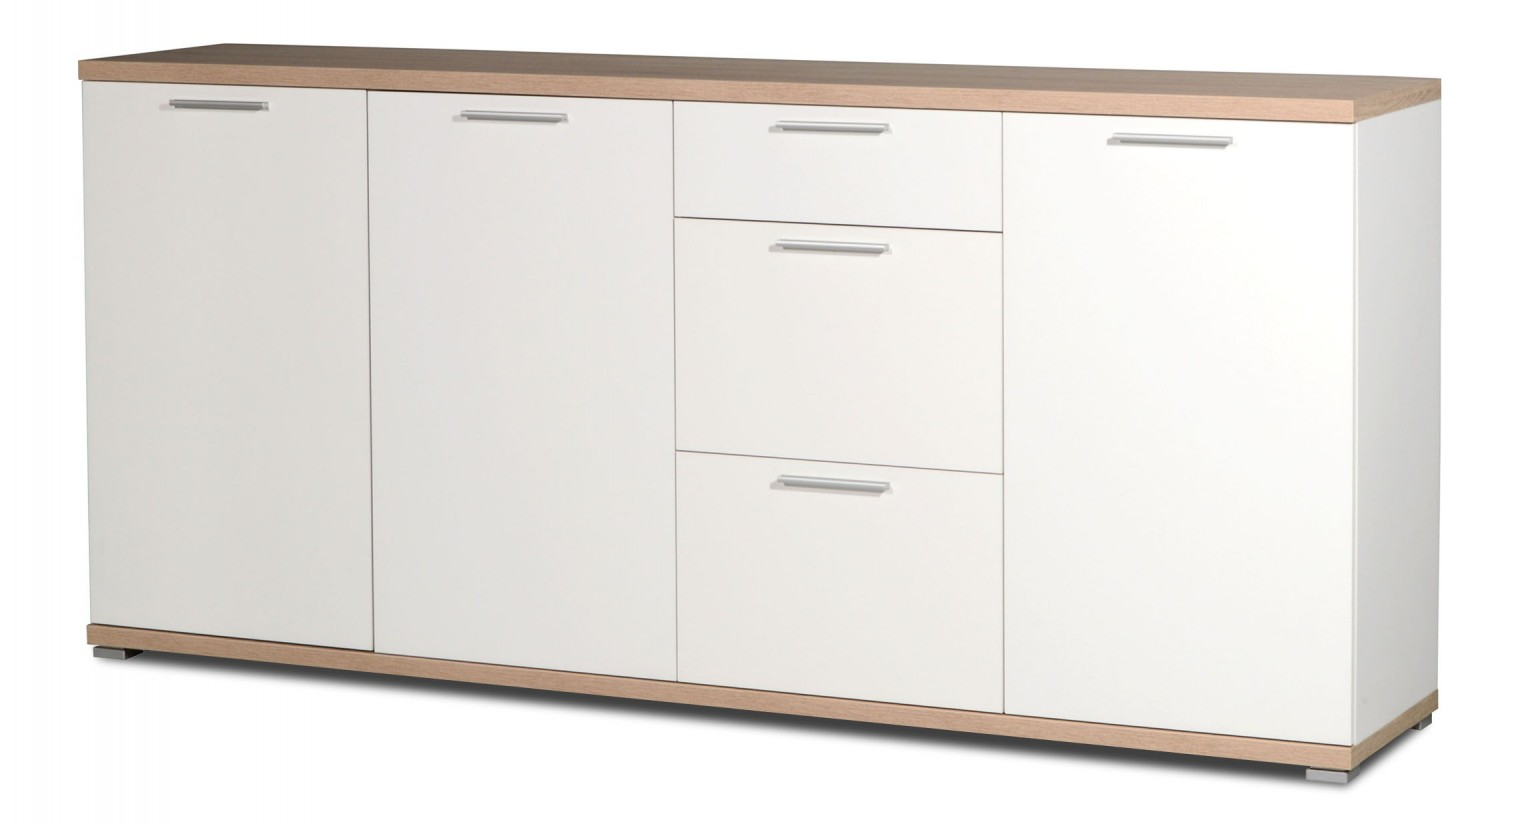 Komoda GW-Top - Skříňka, 3x dveře (bílá / dub sonoma)